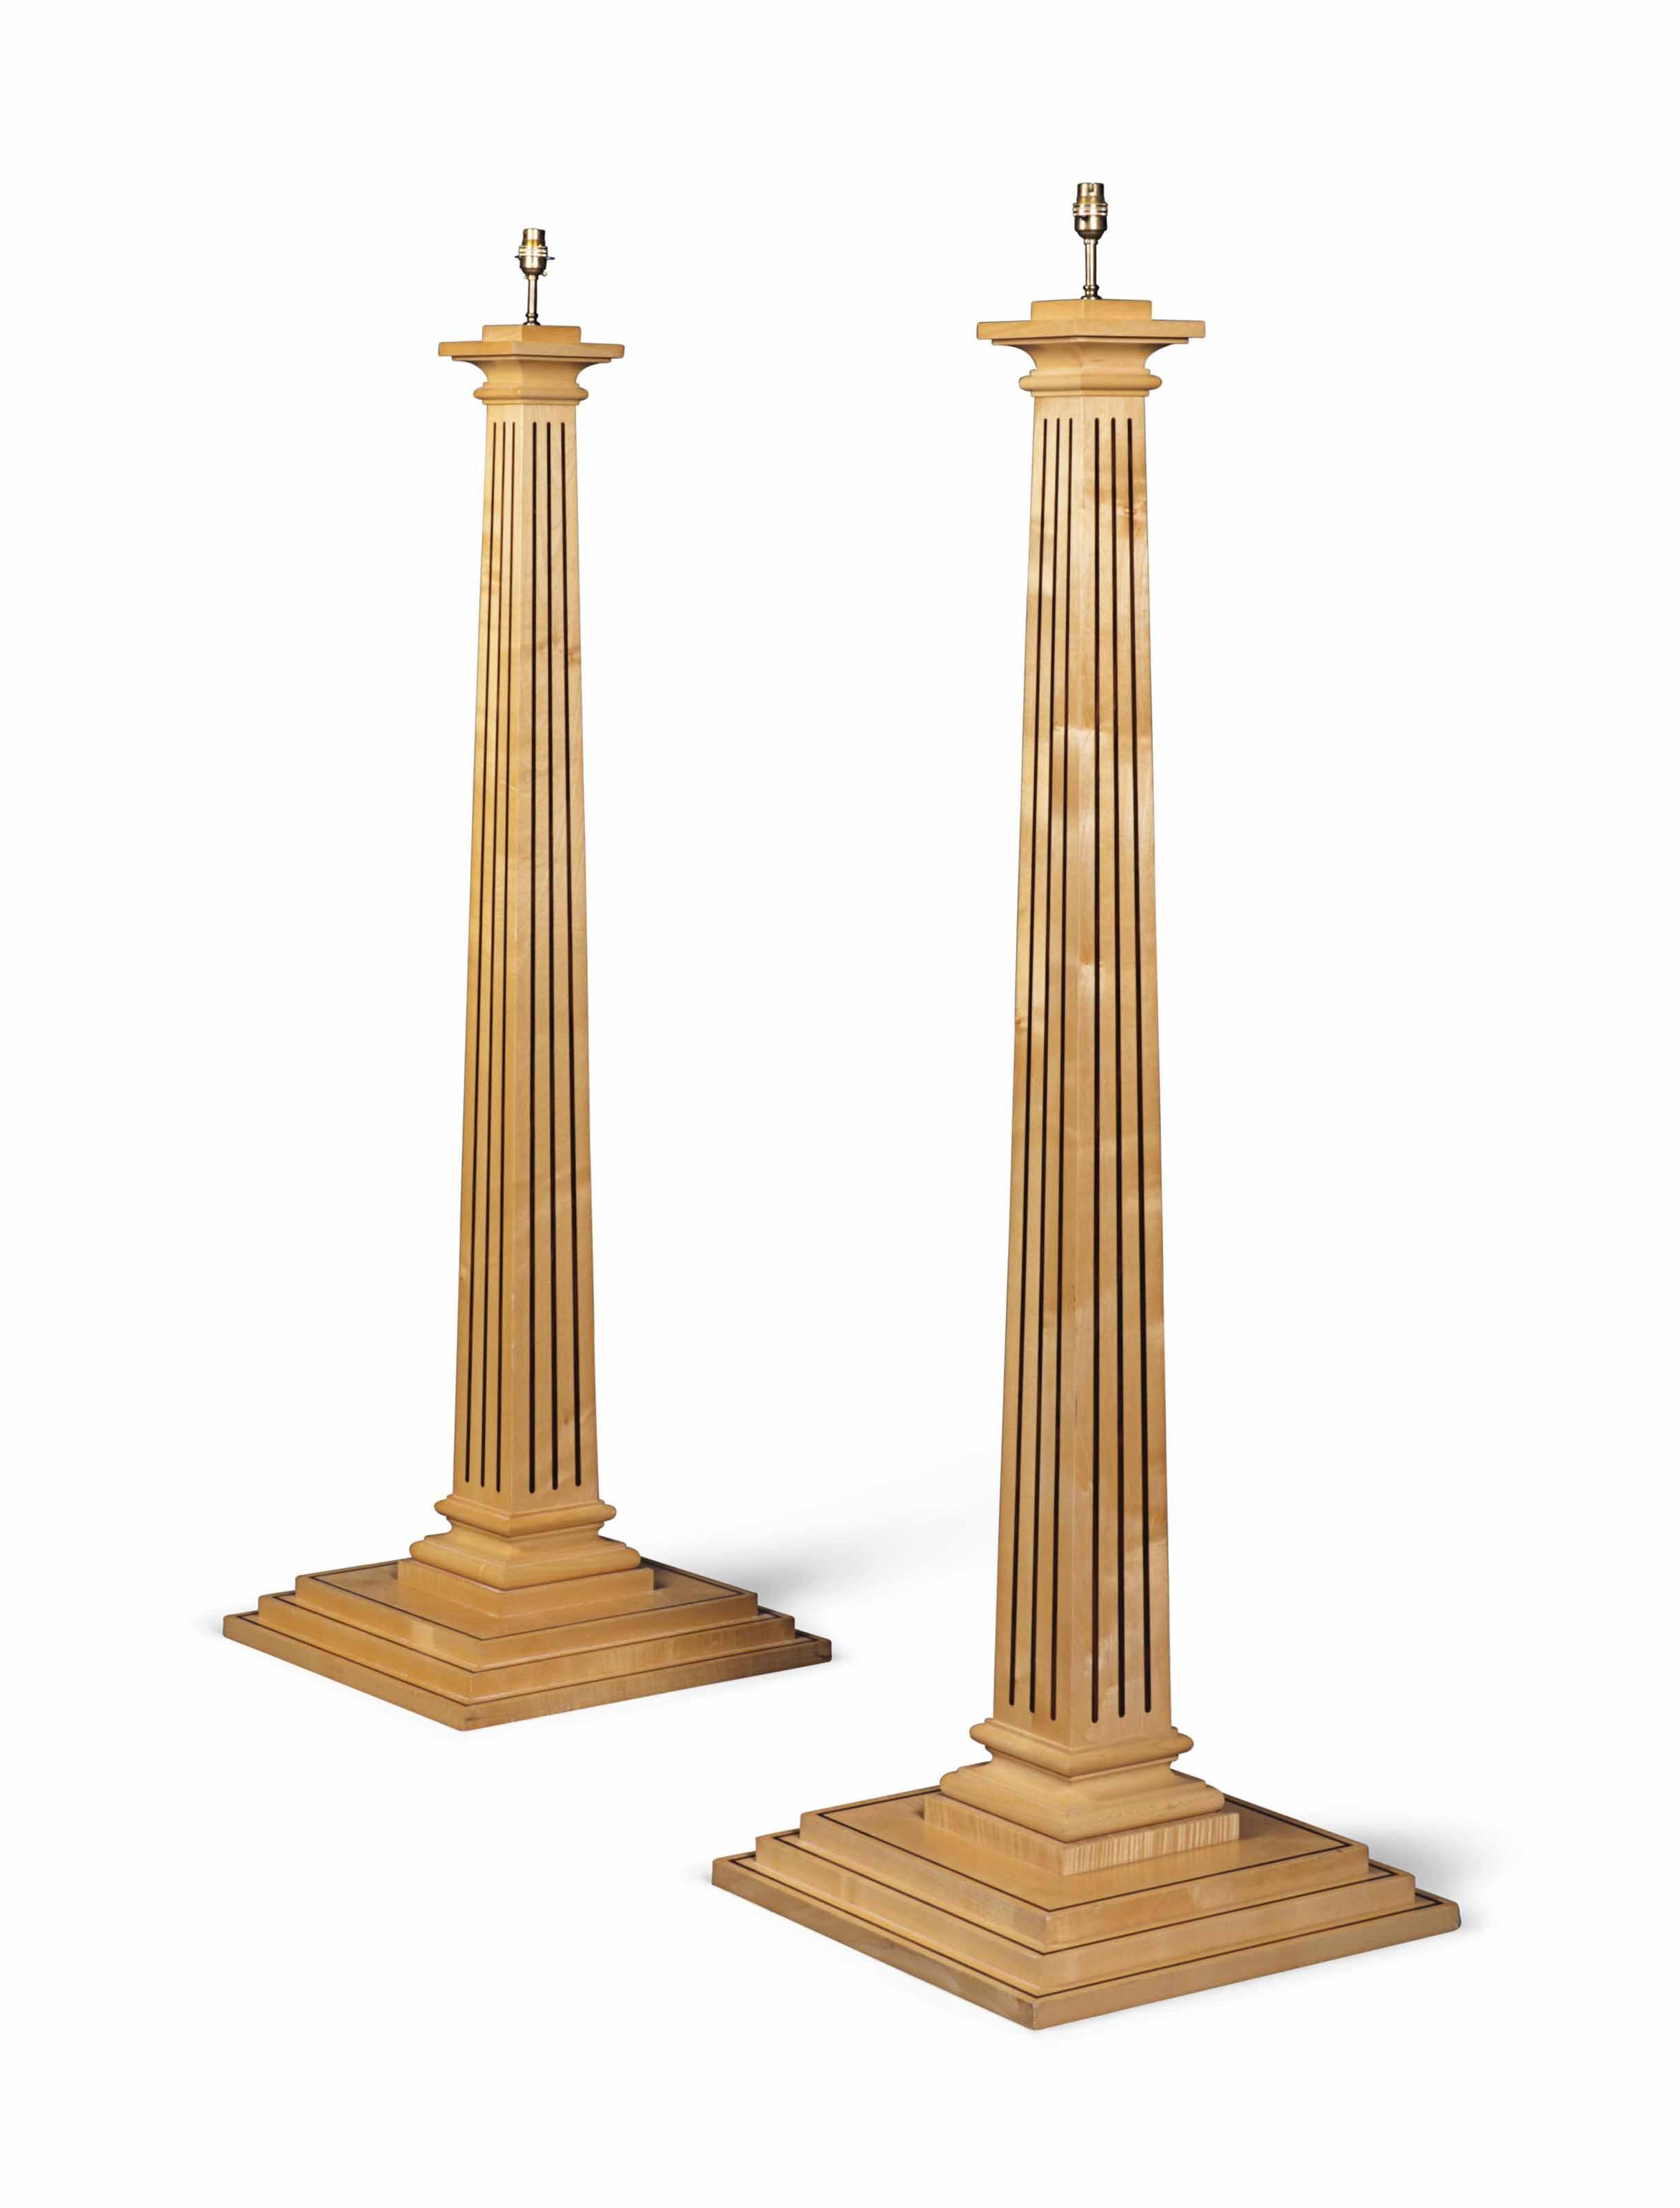 A PAIR OF CALAMANDER-INLAID MAPLE STANDARD LAMPS